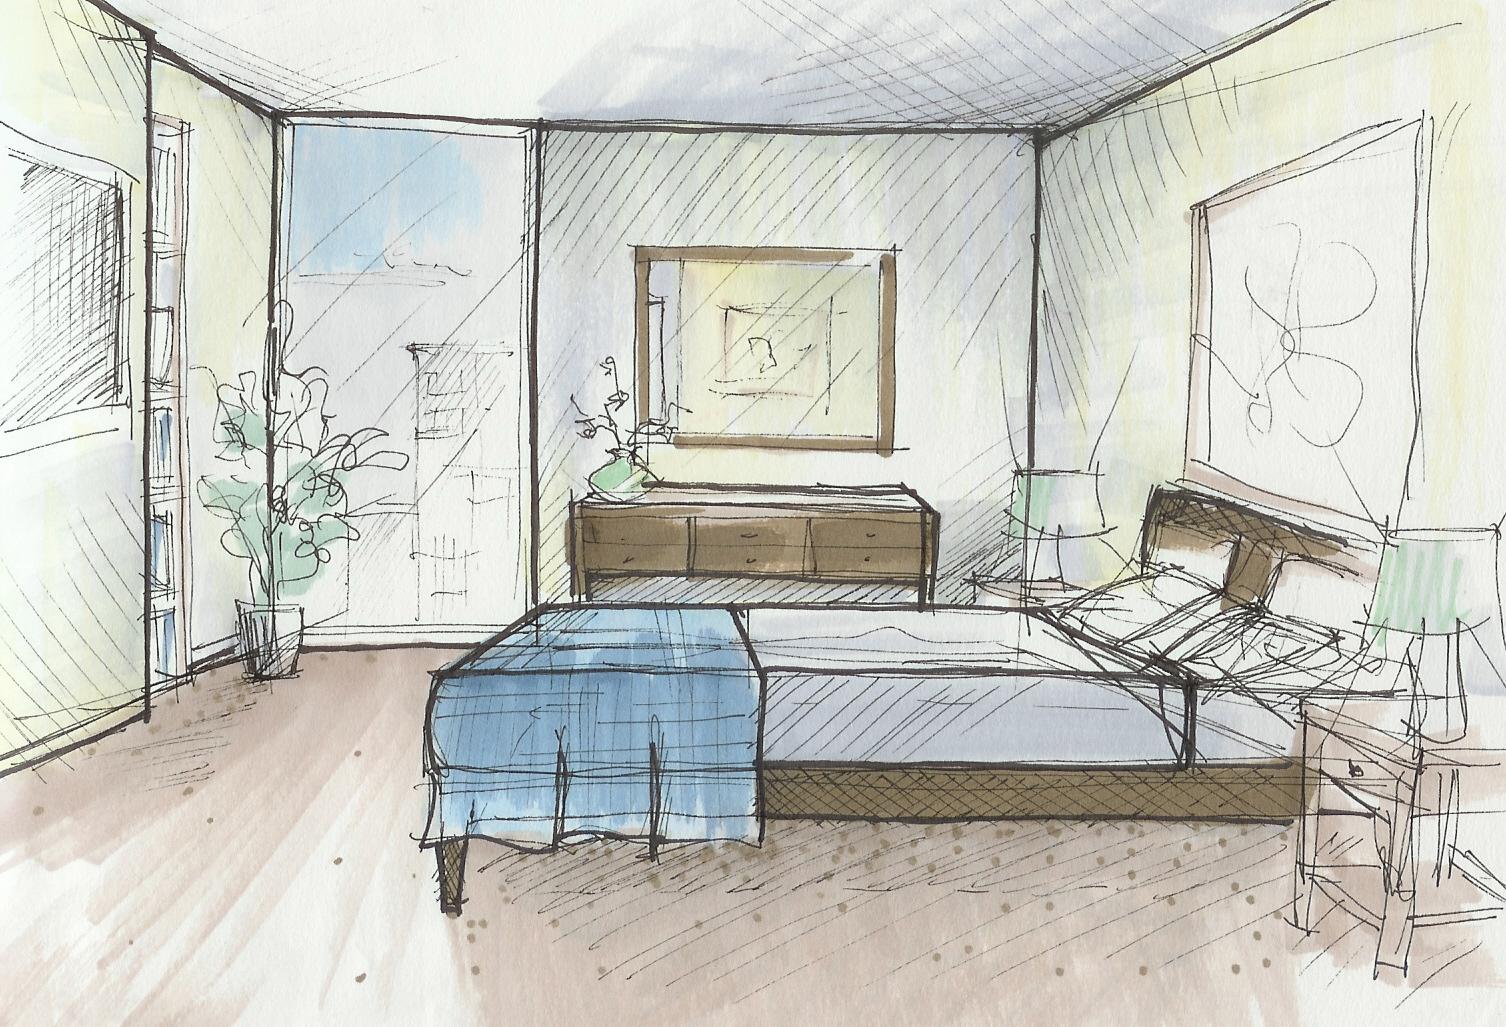 1506x1027 Bedroom Sketch Forathroom Designbedroom With The Description